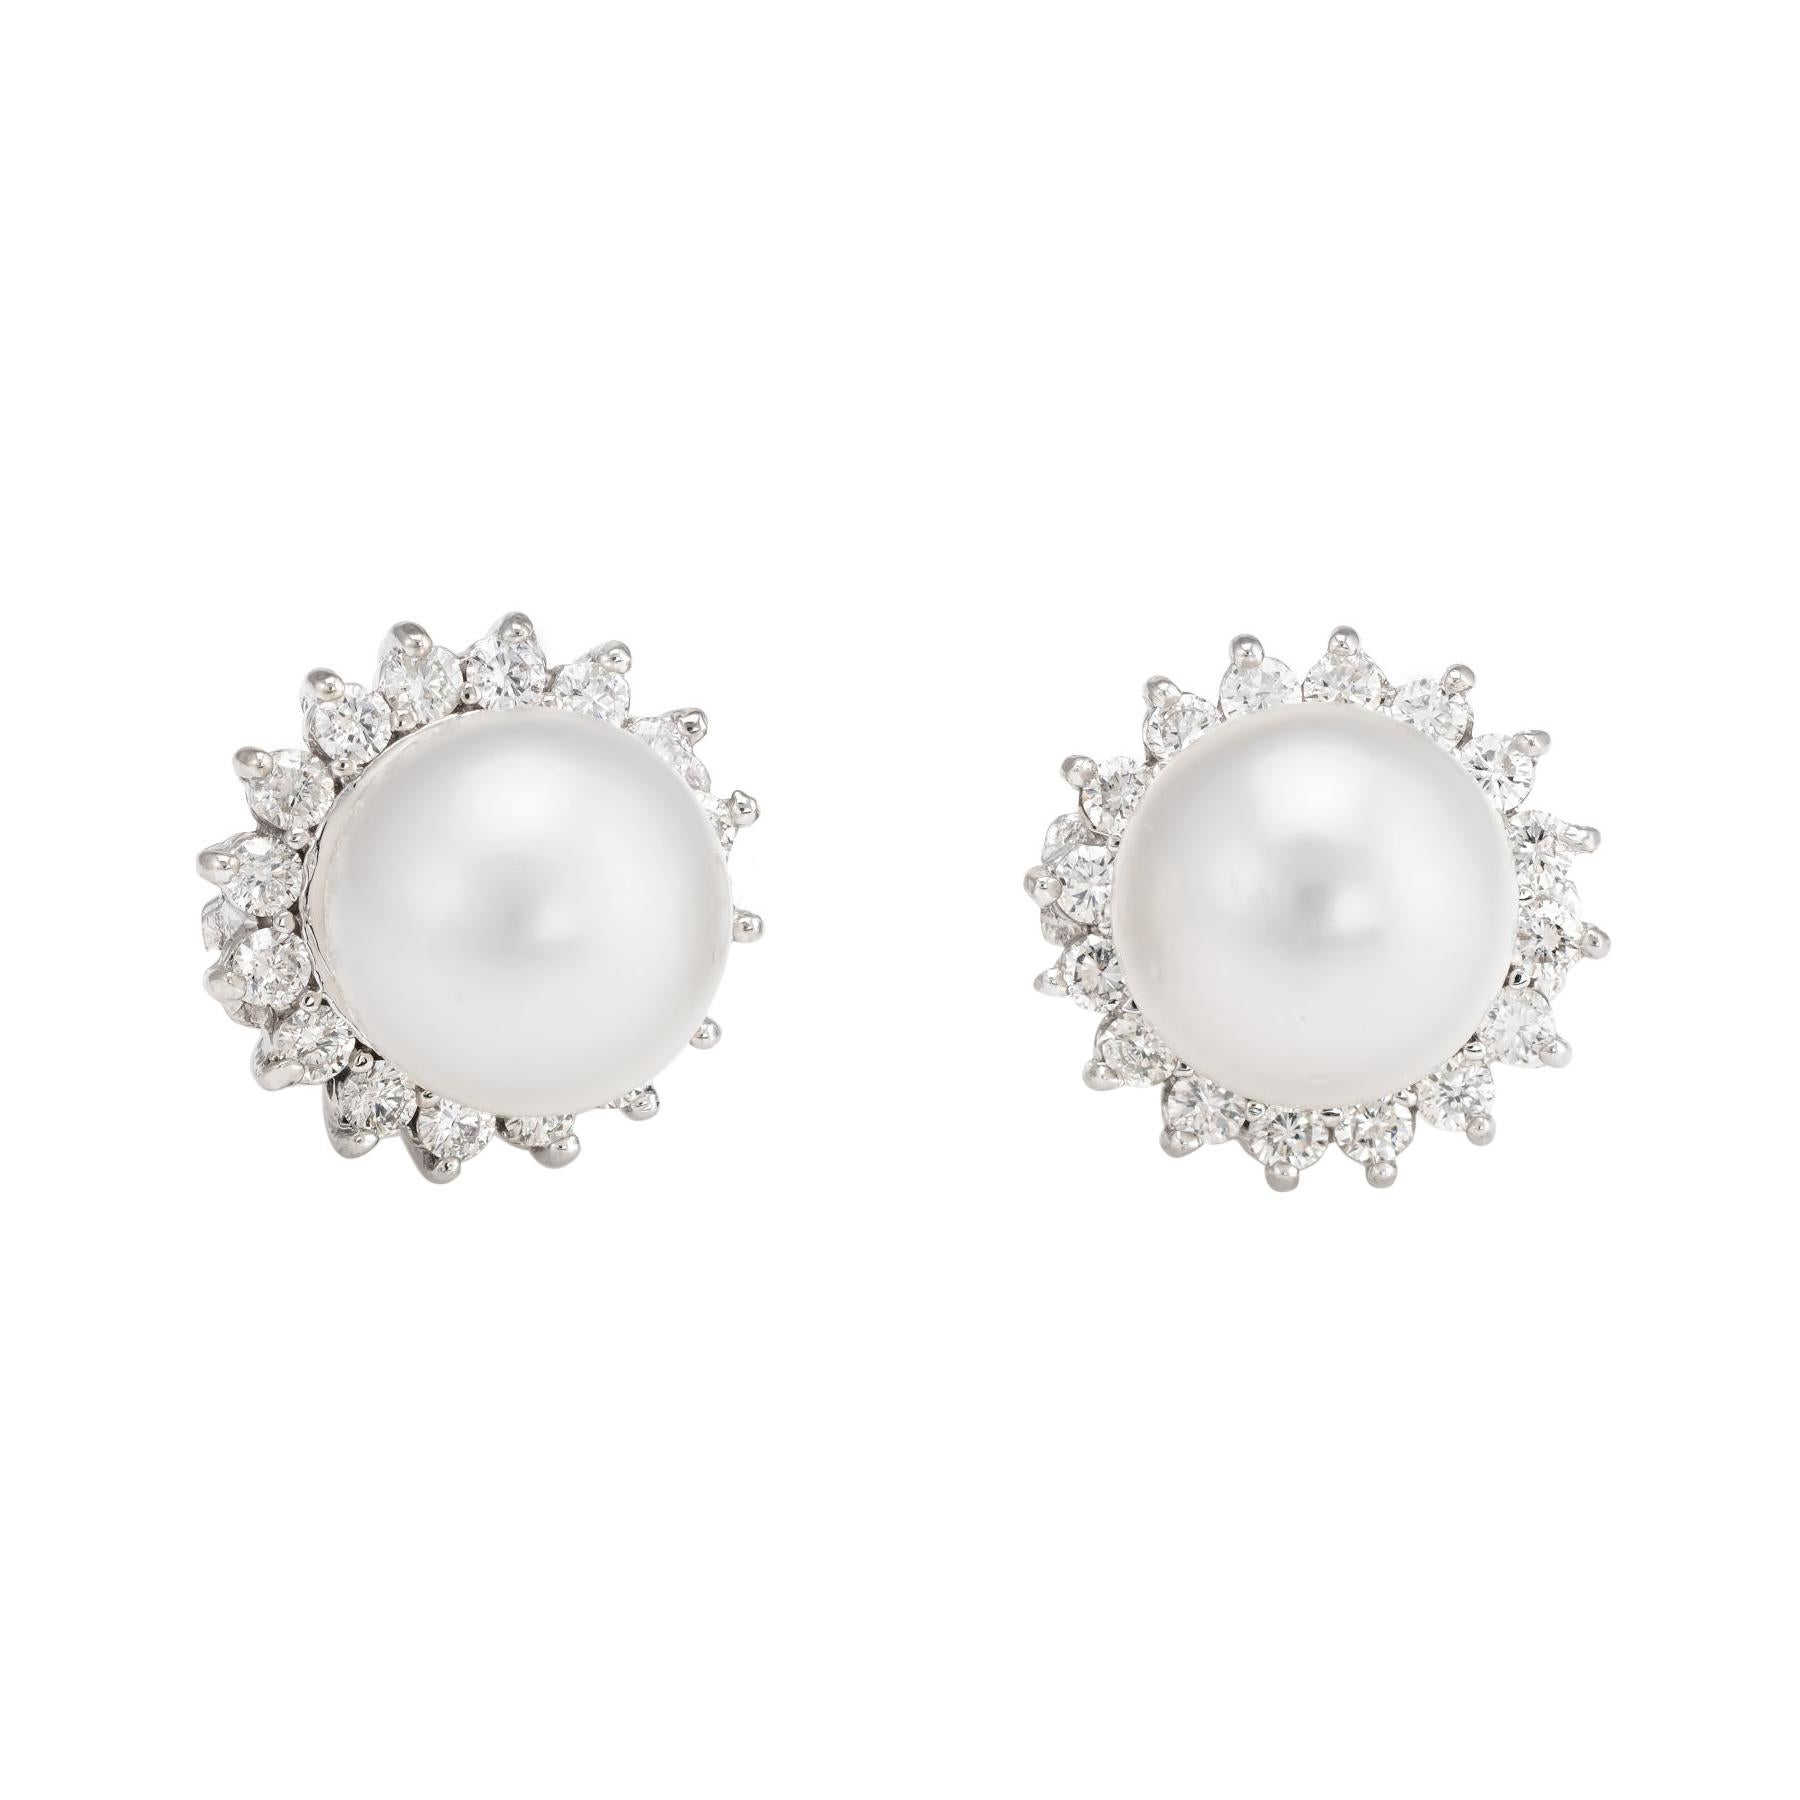 Tahitian South Sea Pearl Diamond Earrings Vintage 14k White Gold Jewelry